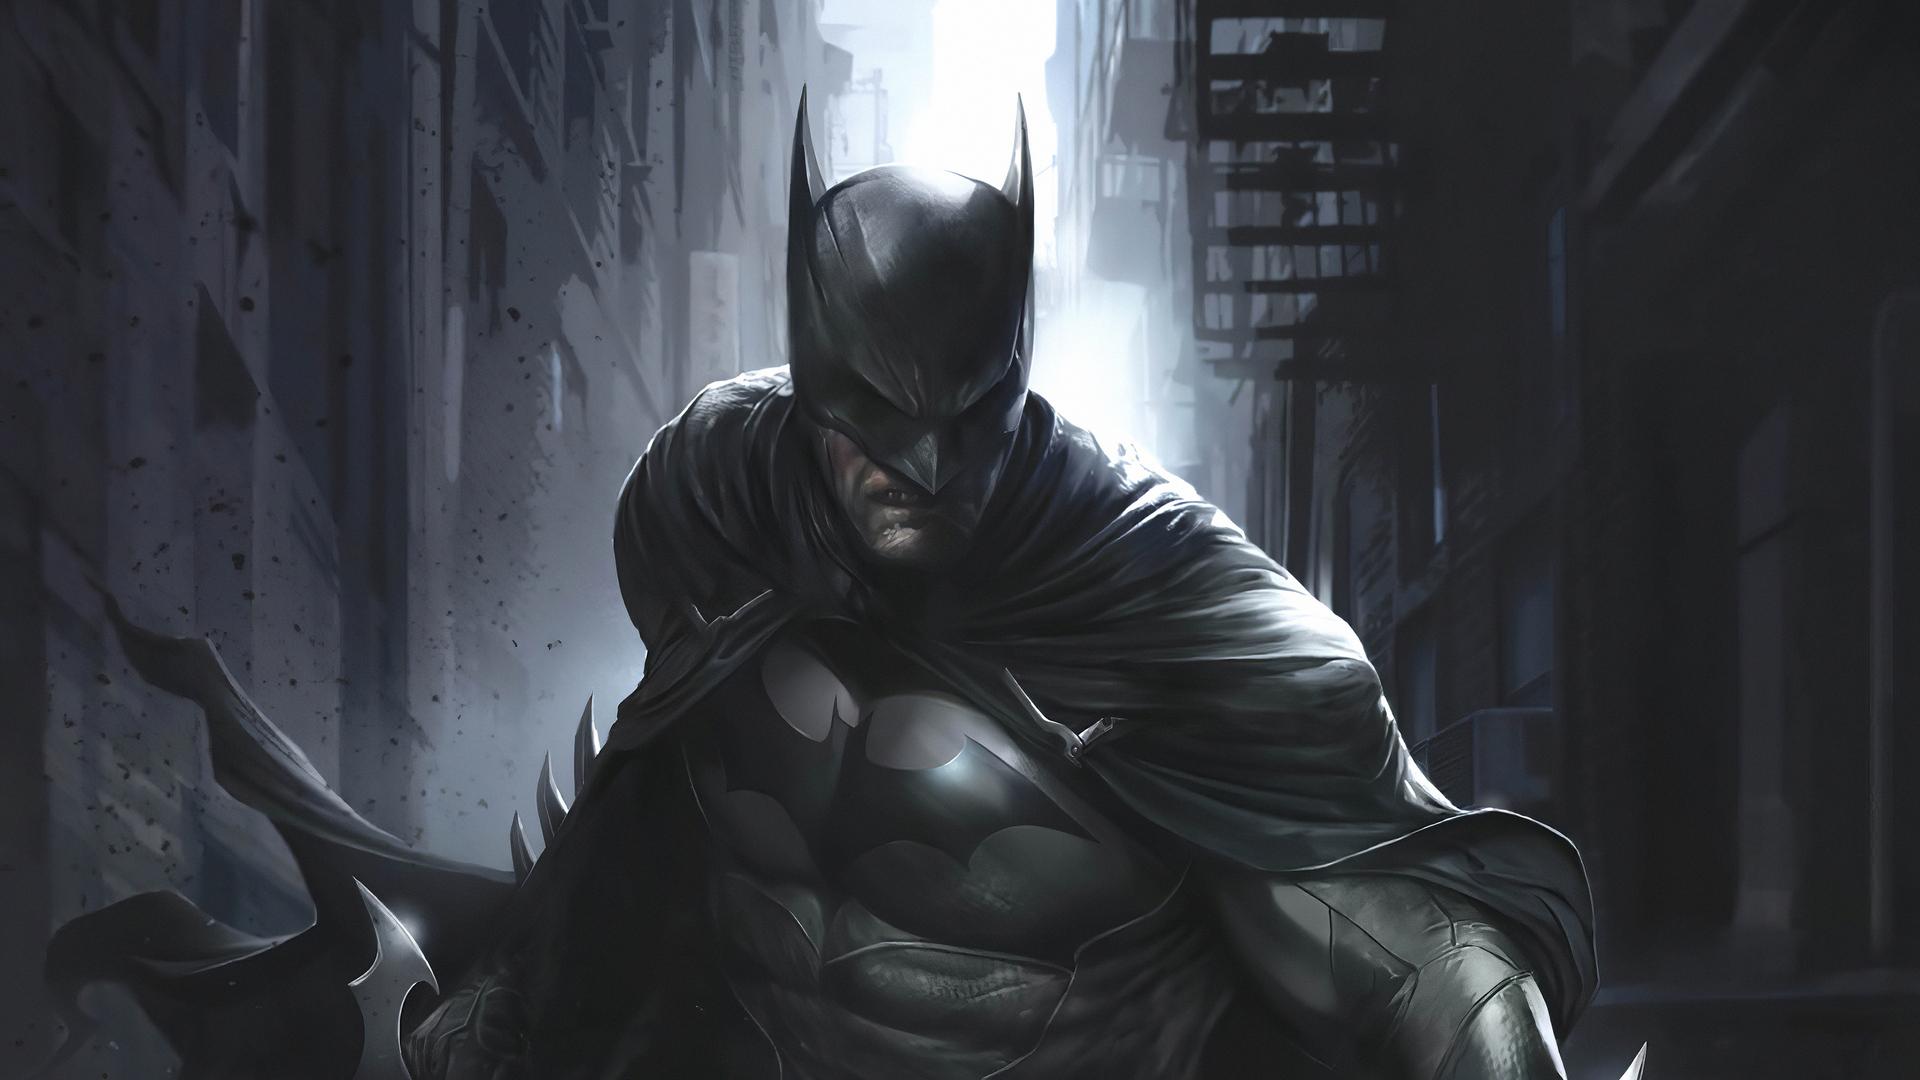 1920x1080 Artwork Batman 4k 2020 Laptop Full HD 1080P HD ...